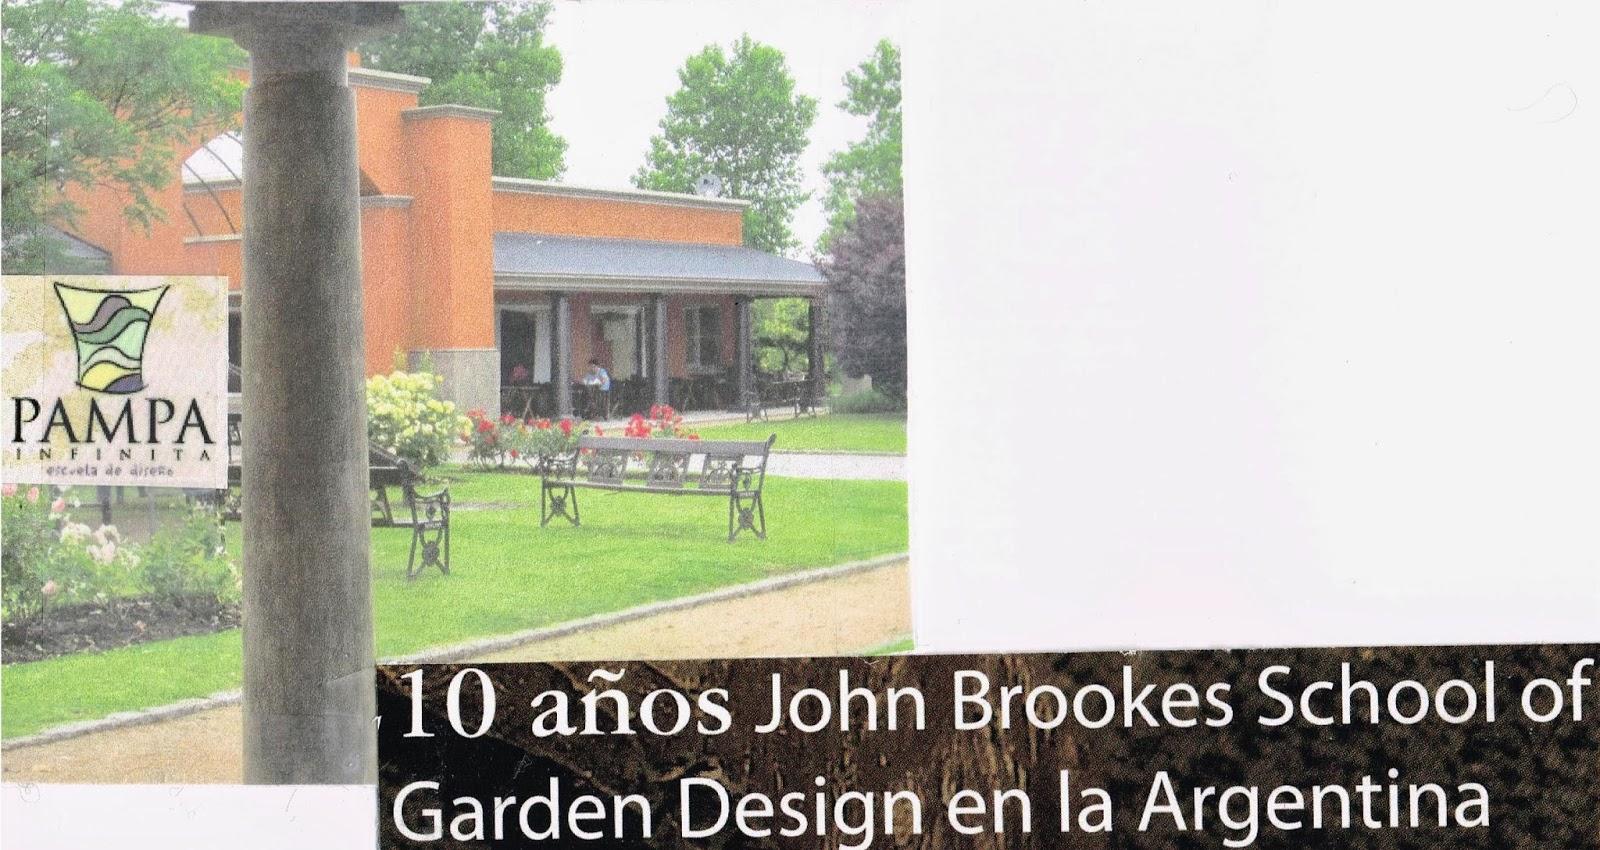 Travels in south america john brookes raves rants - Garden design john brookes ...